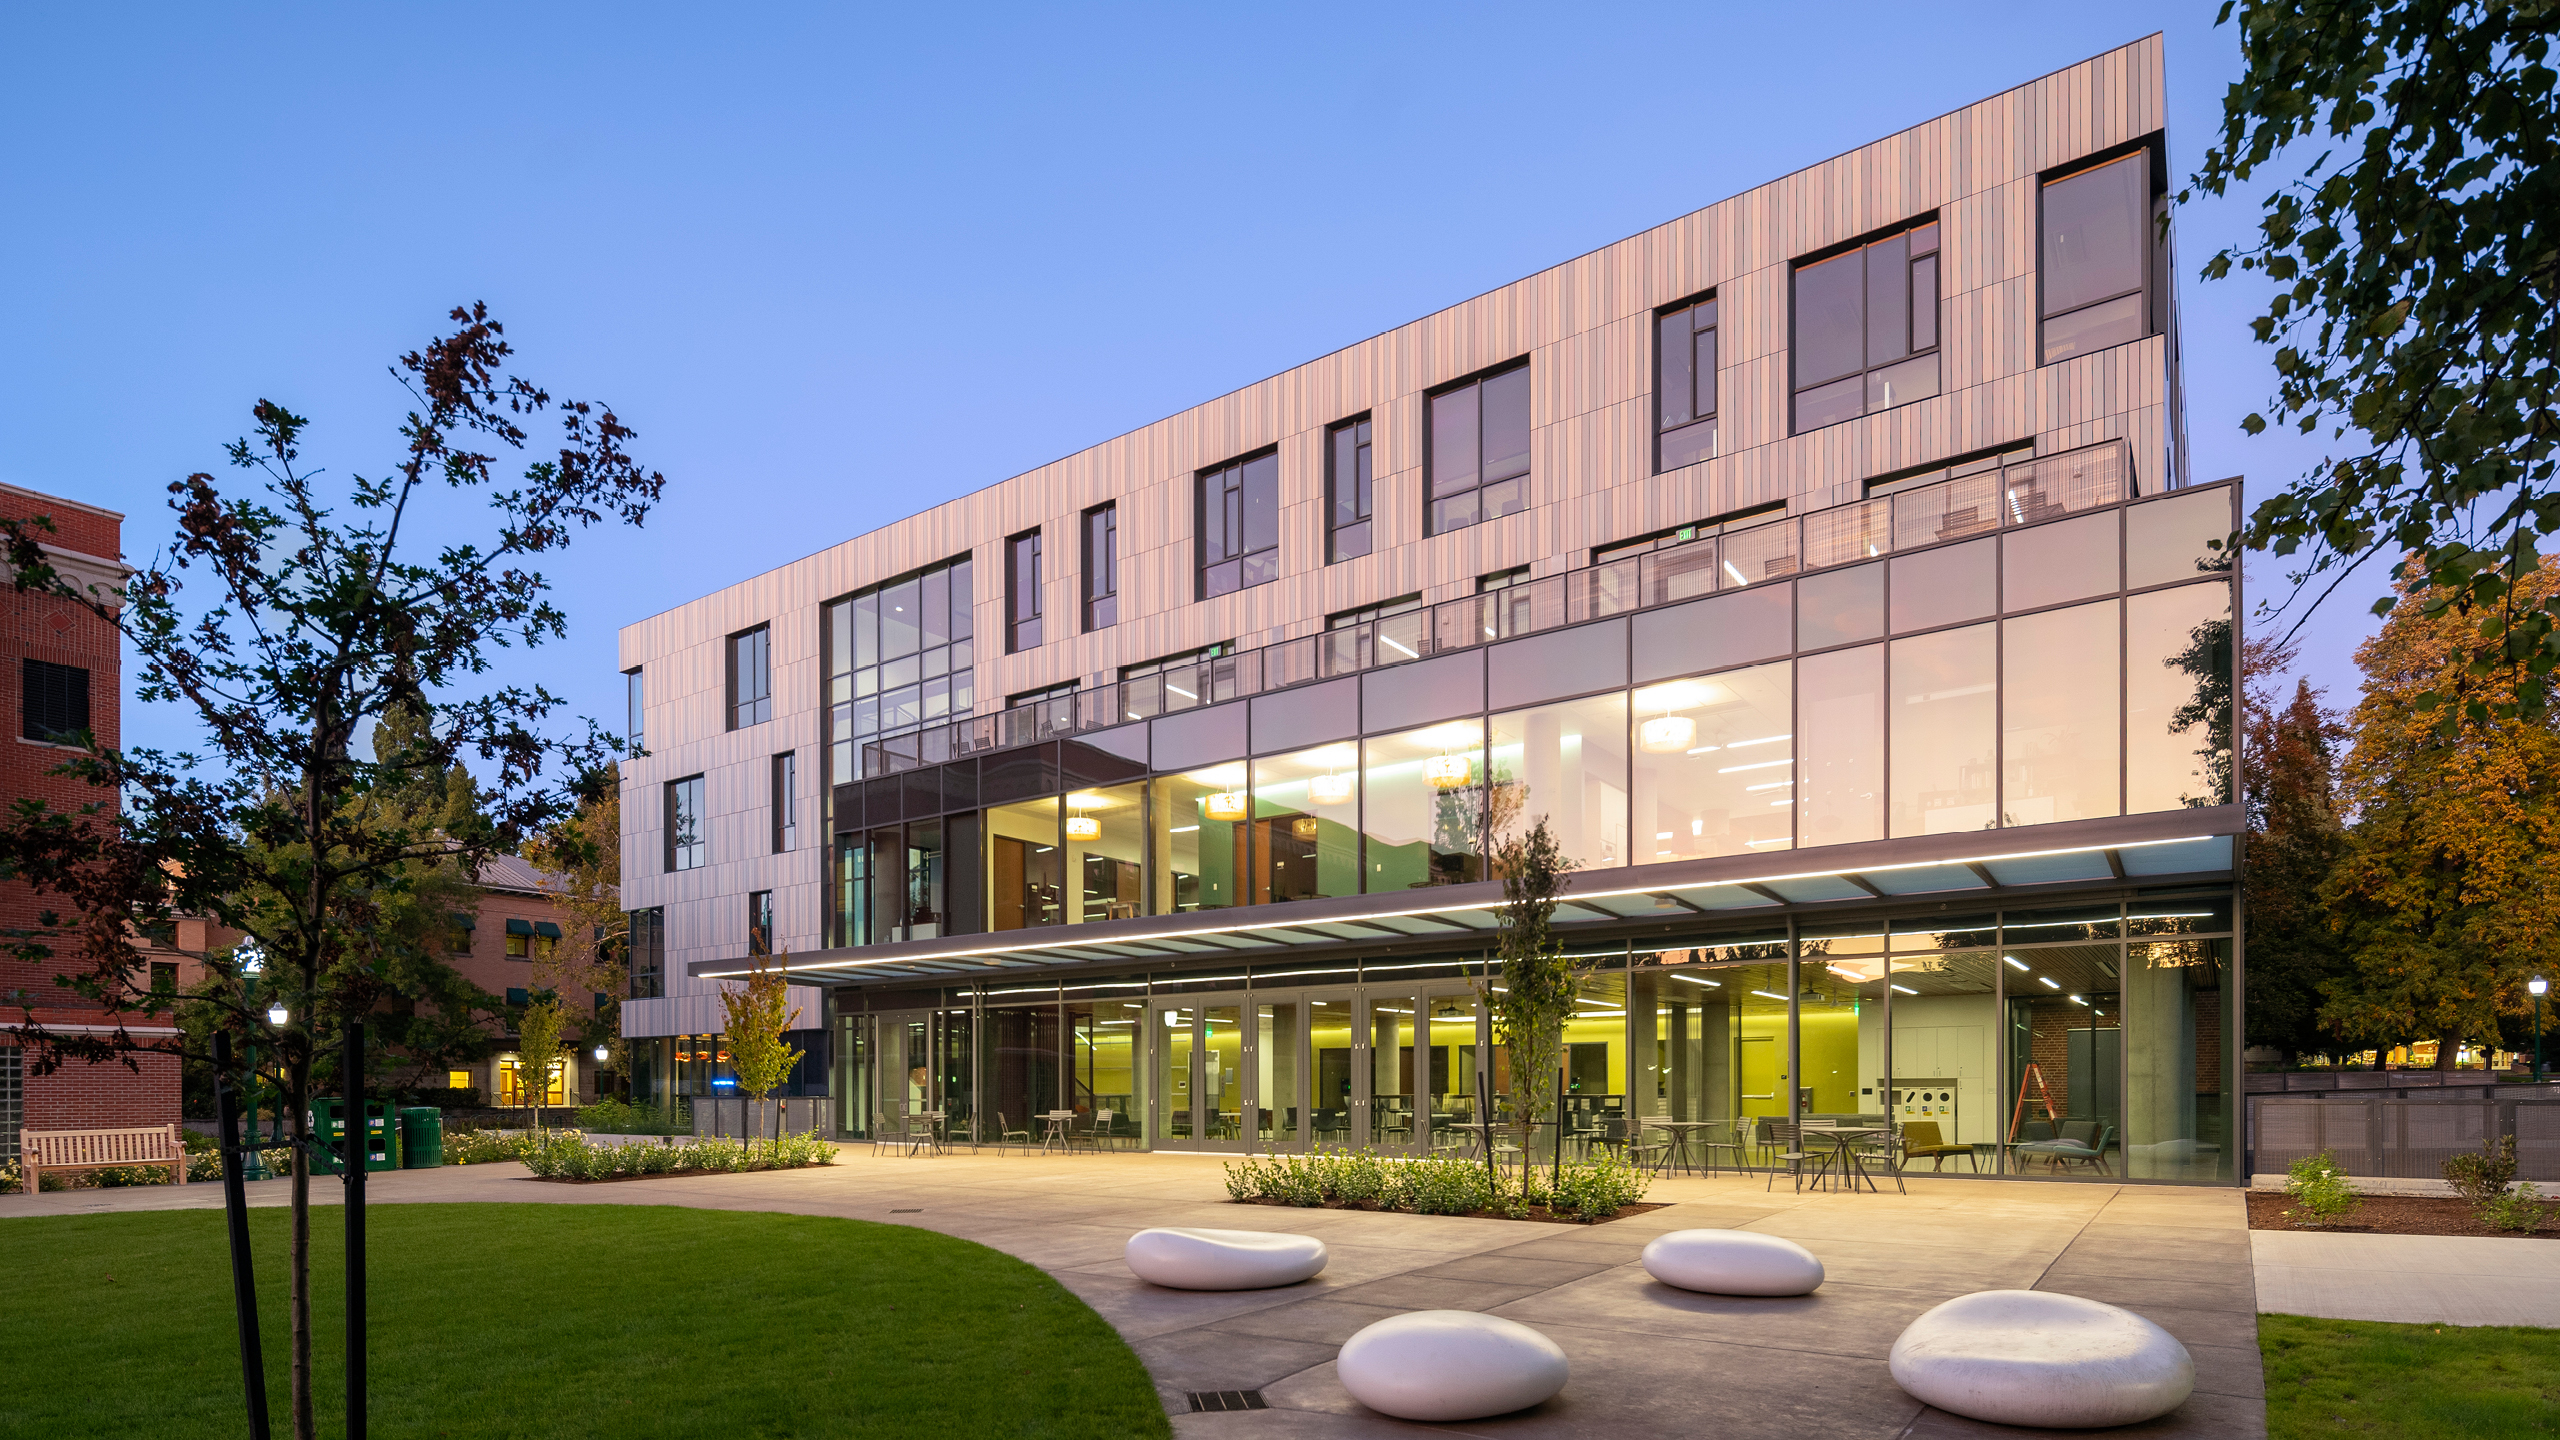 Tykeson Hall at the University of Oregon / image 20